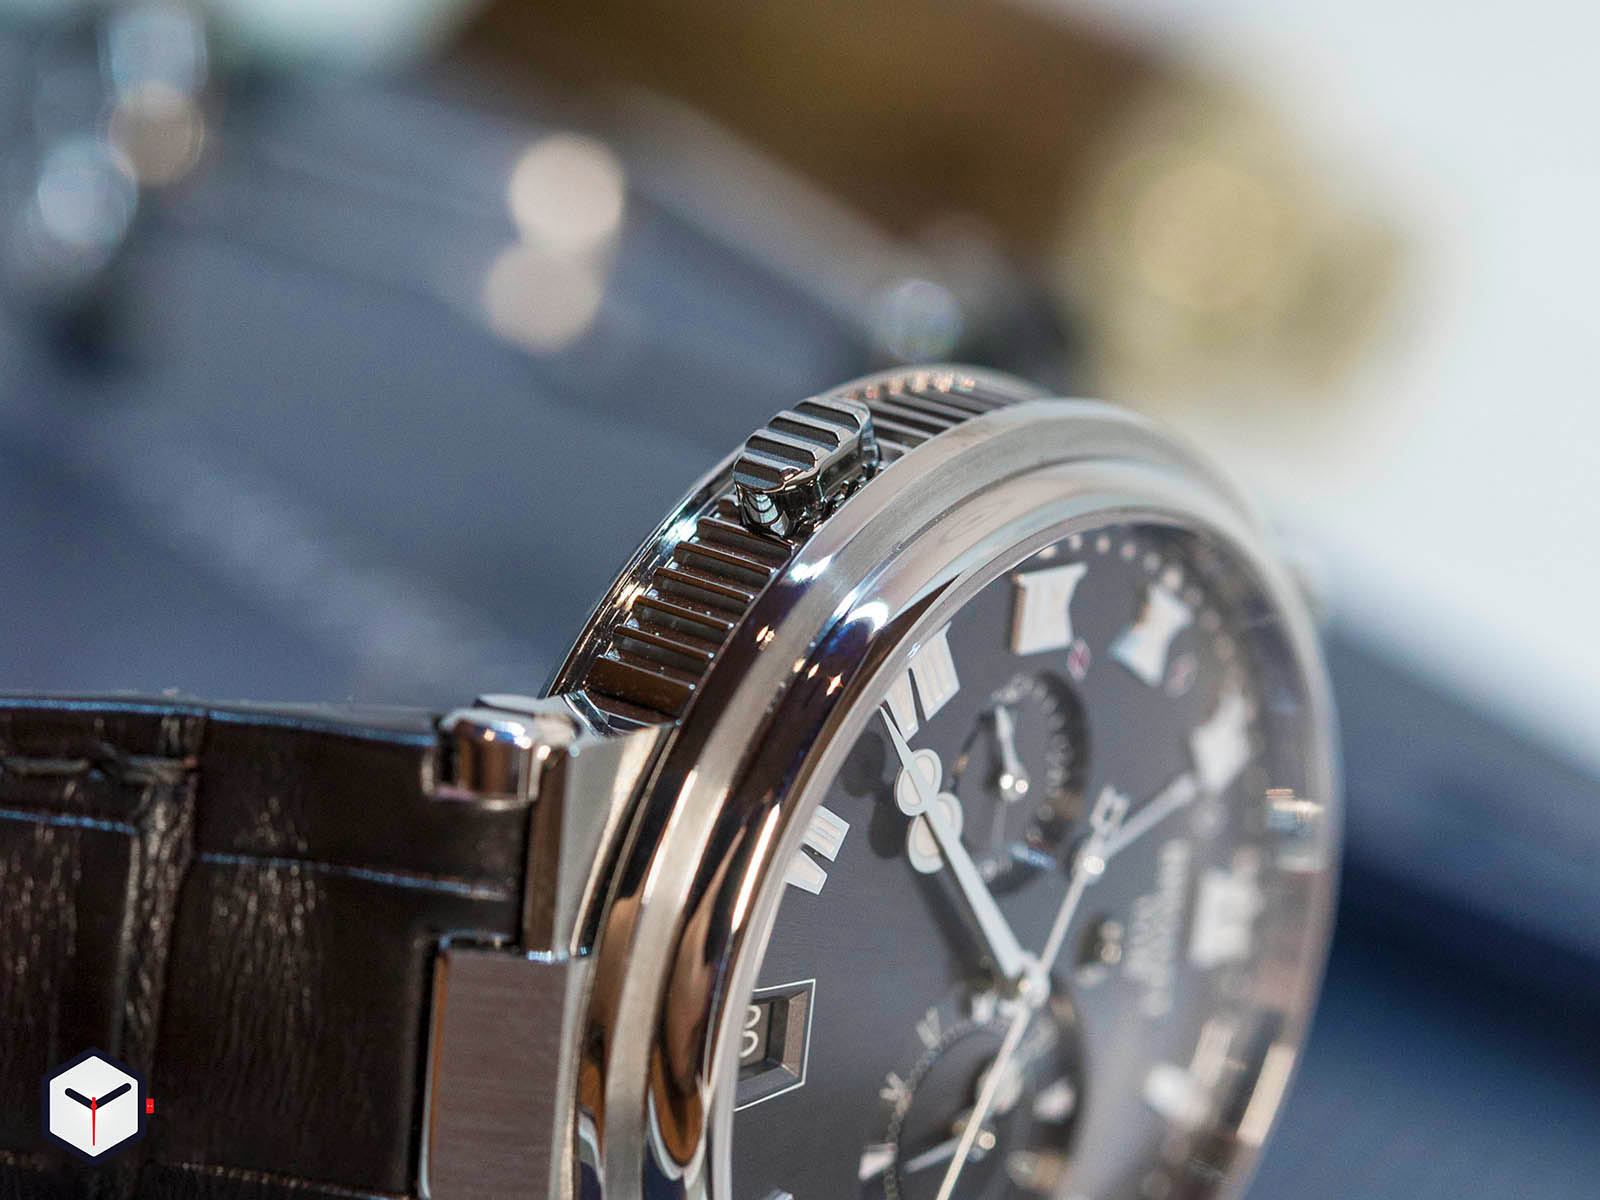 mechanical-alarm-watches-breguet-marine-alarme-musicale-2.jpg